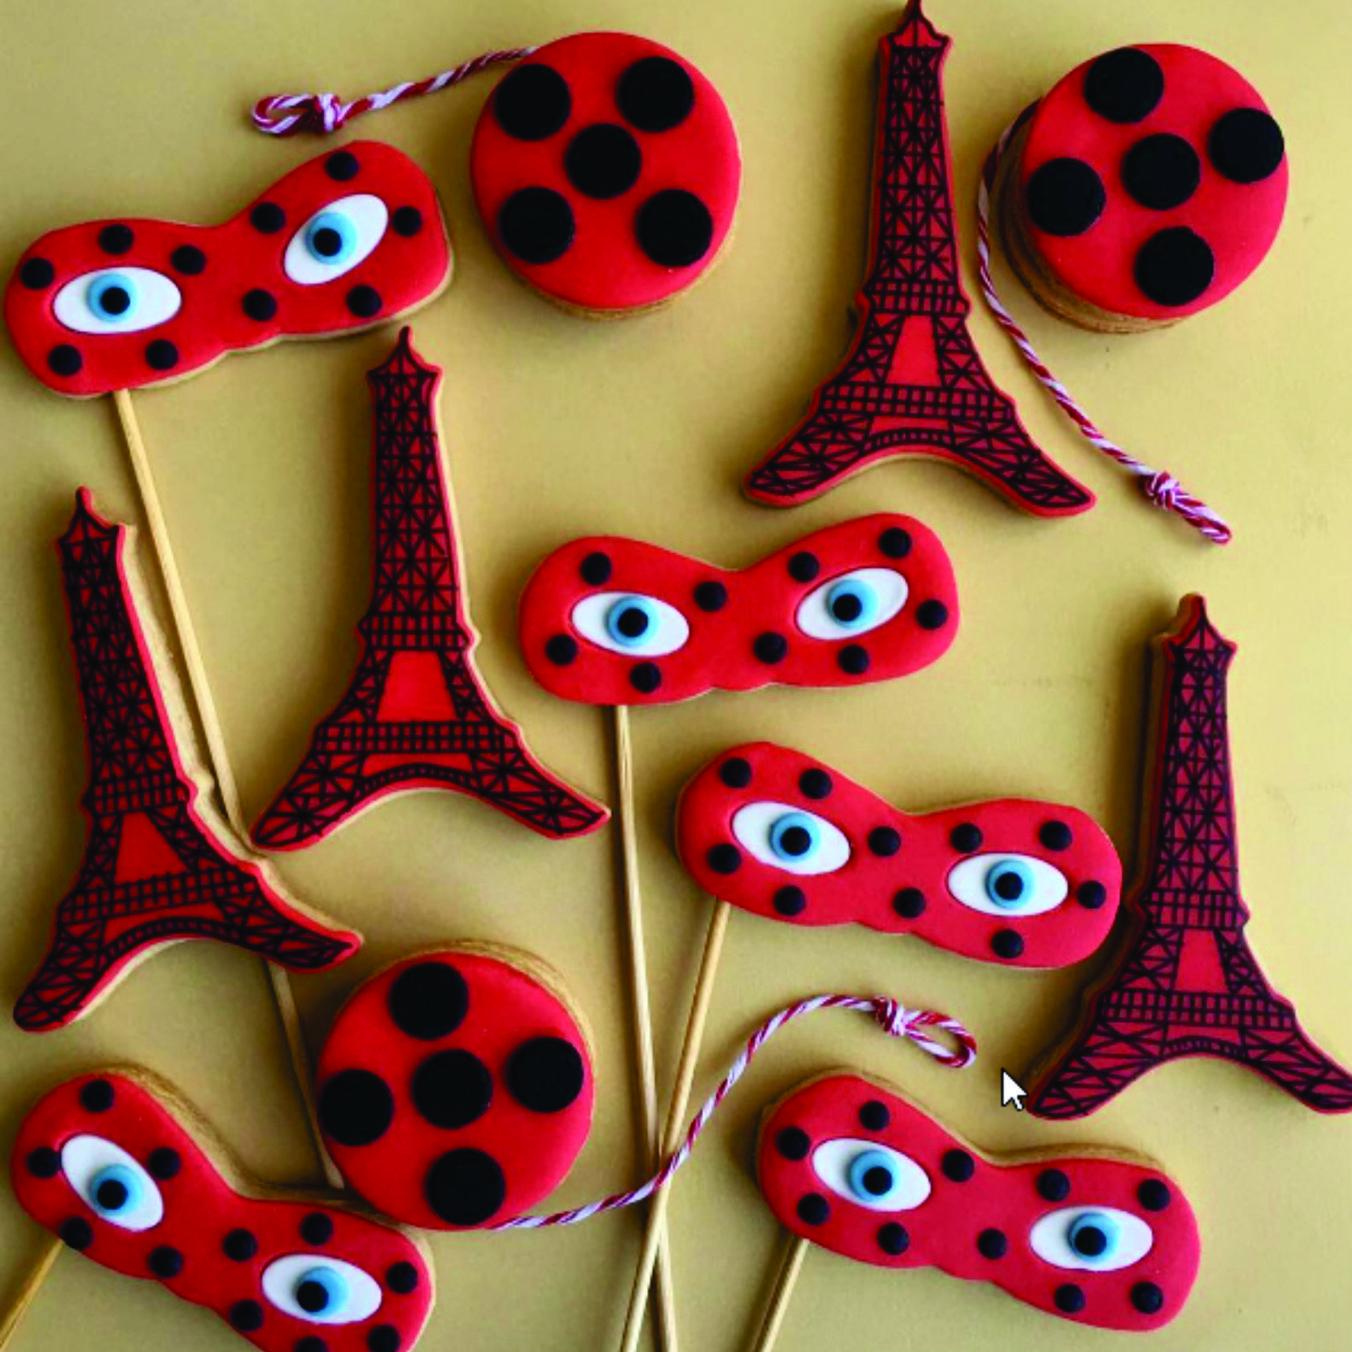 ideias decoracao festa ladybug bolachas decoradas